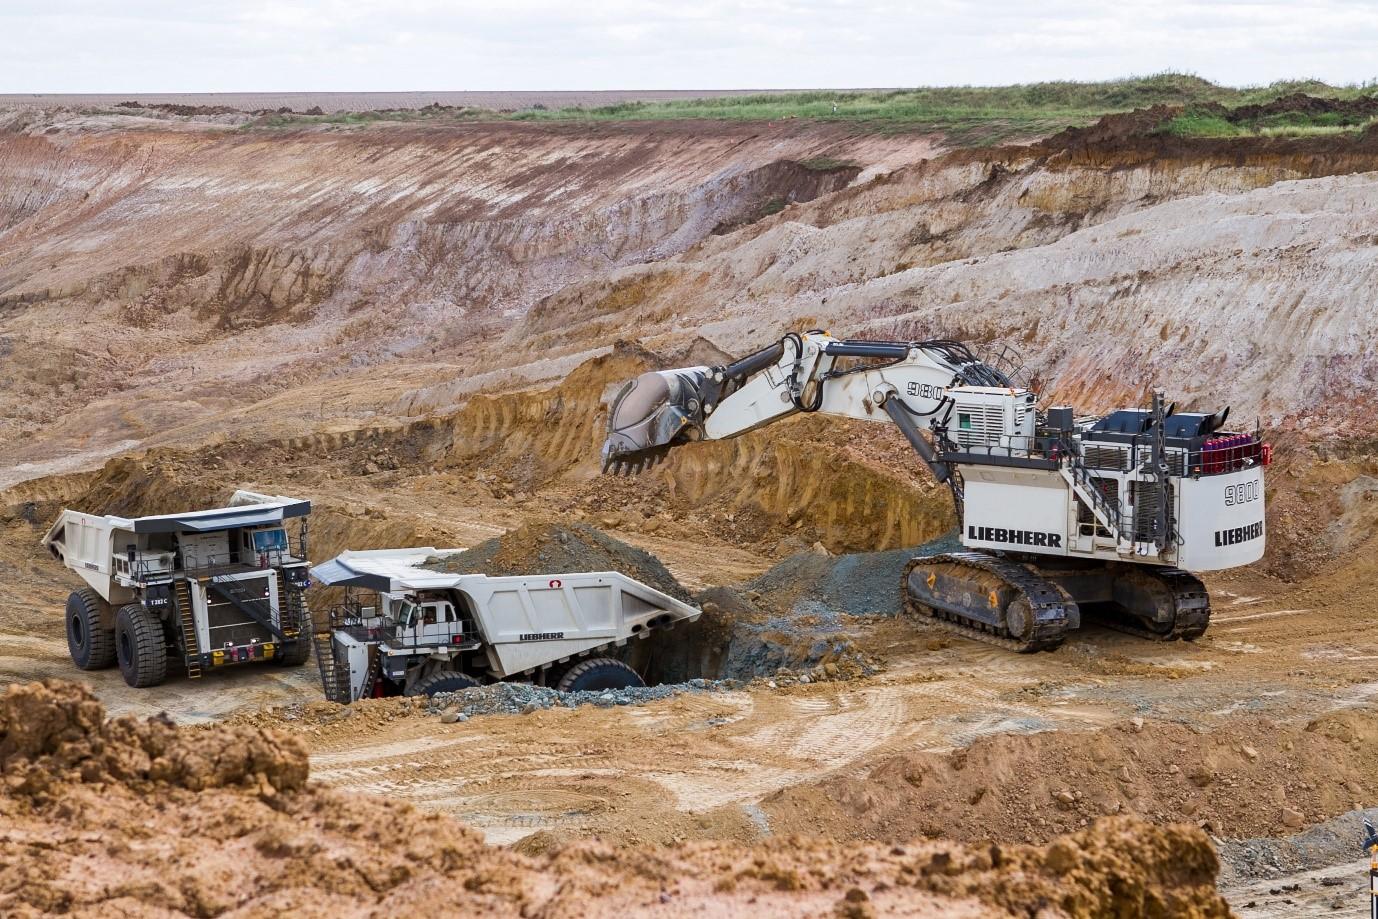 Liebherr R9800 Excavator and dump trucks for mining